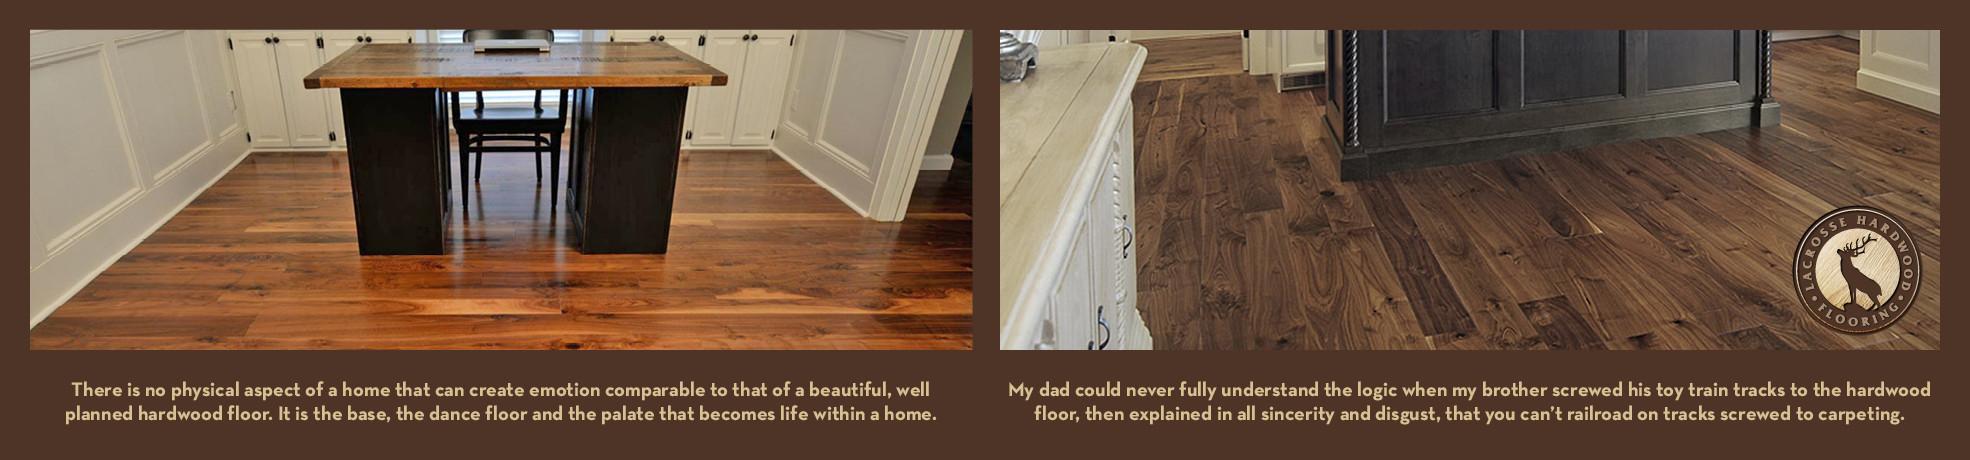 how to install hardwood floors on second floor of lacrosse hardwood flooring walnut white oak red oak hickory regarding lhfsliderv22